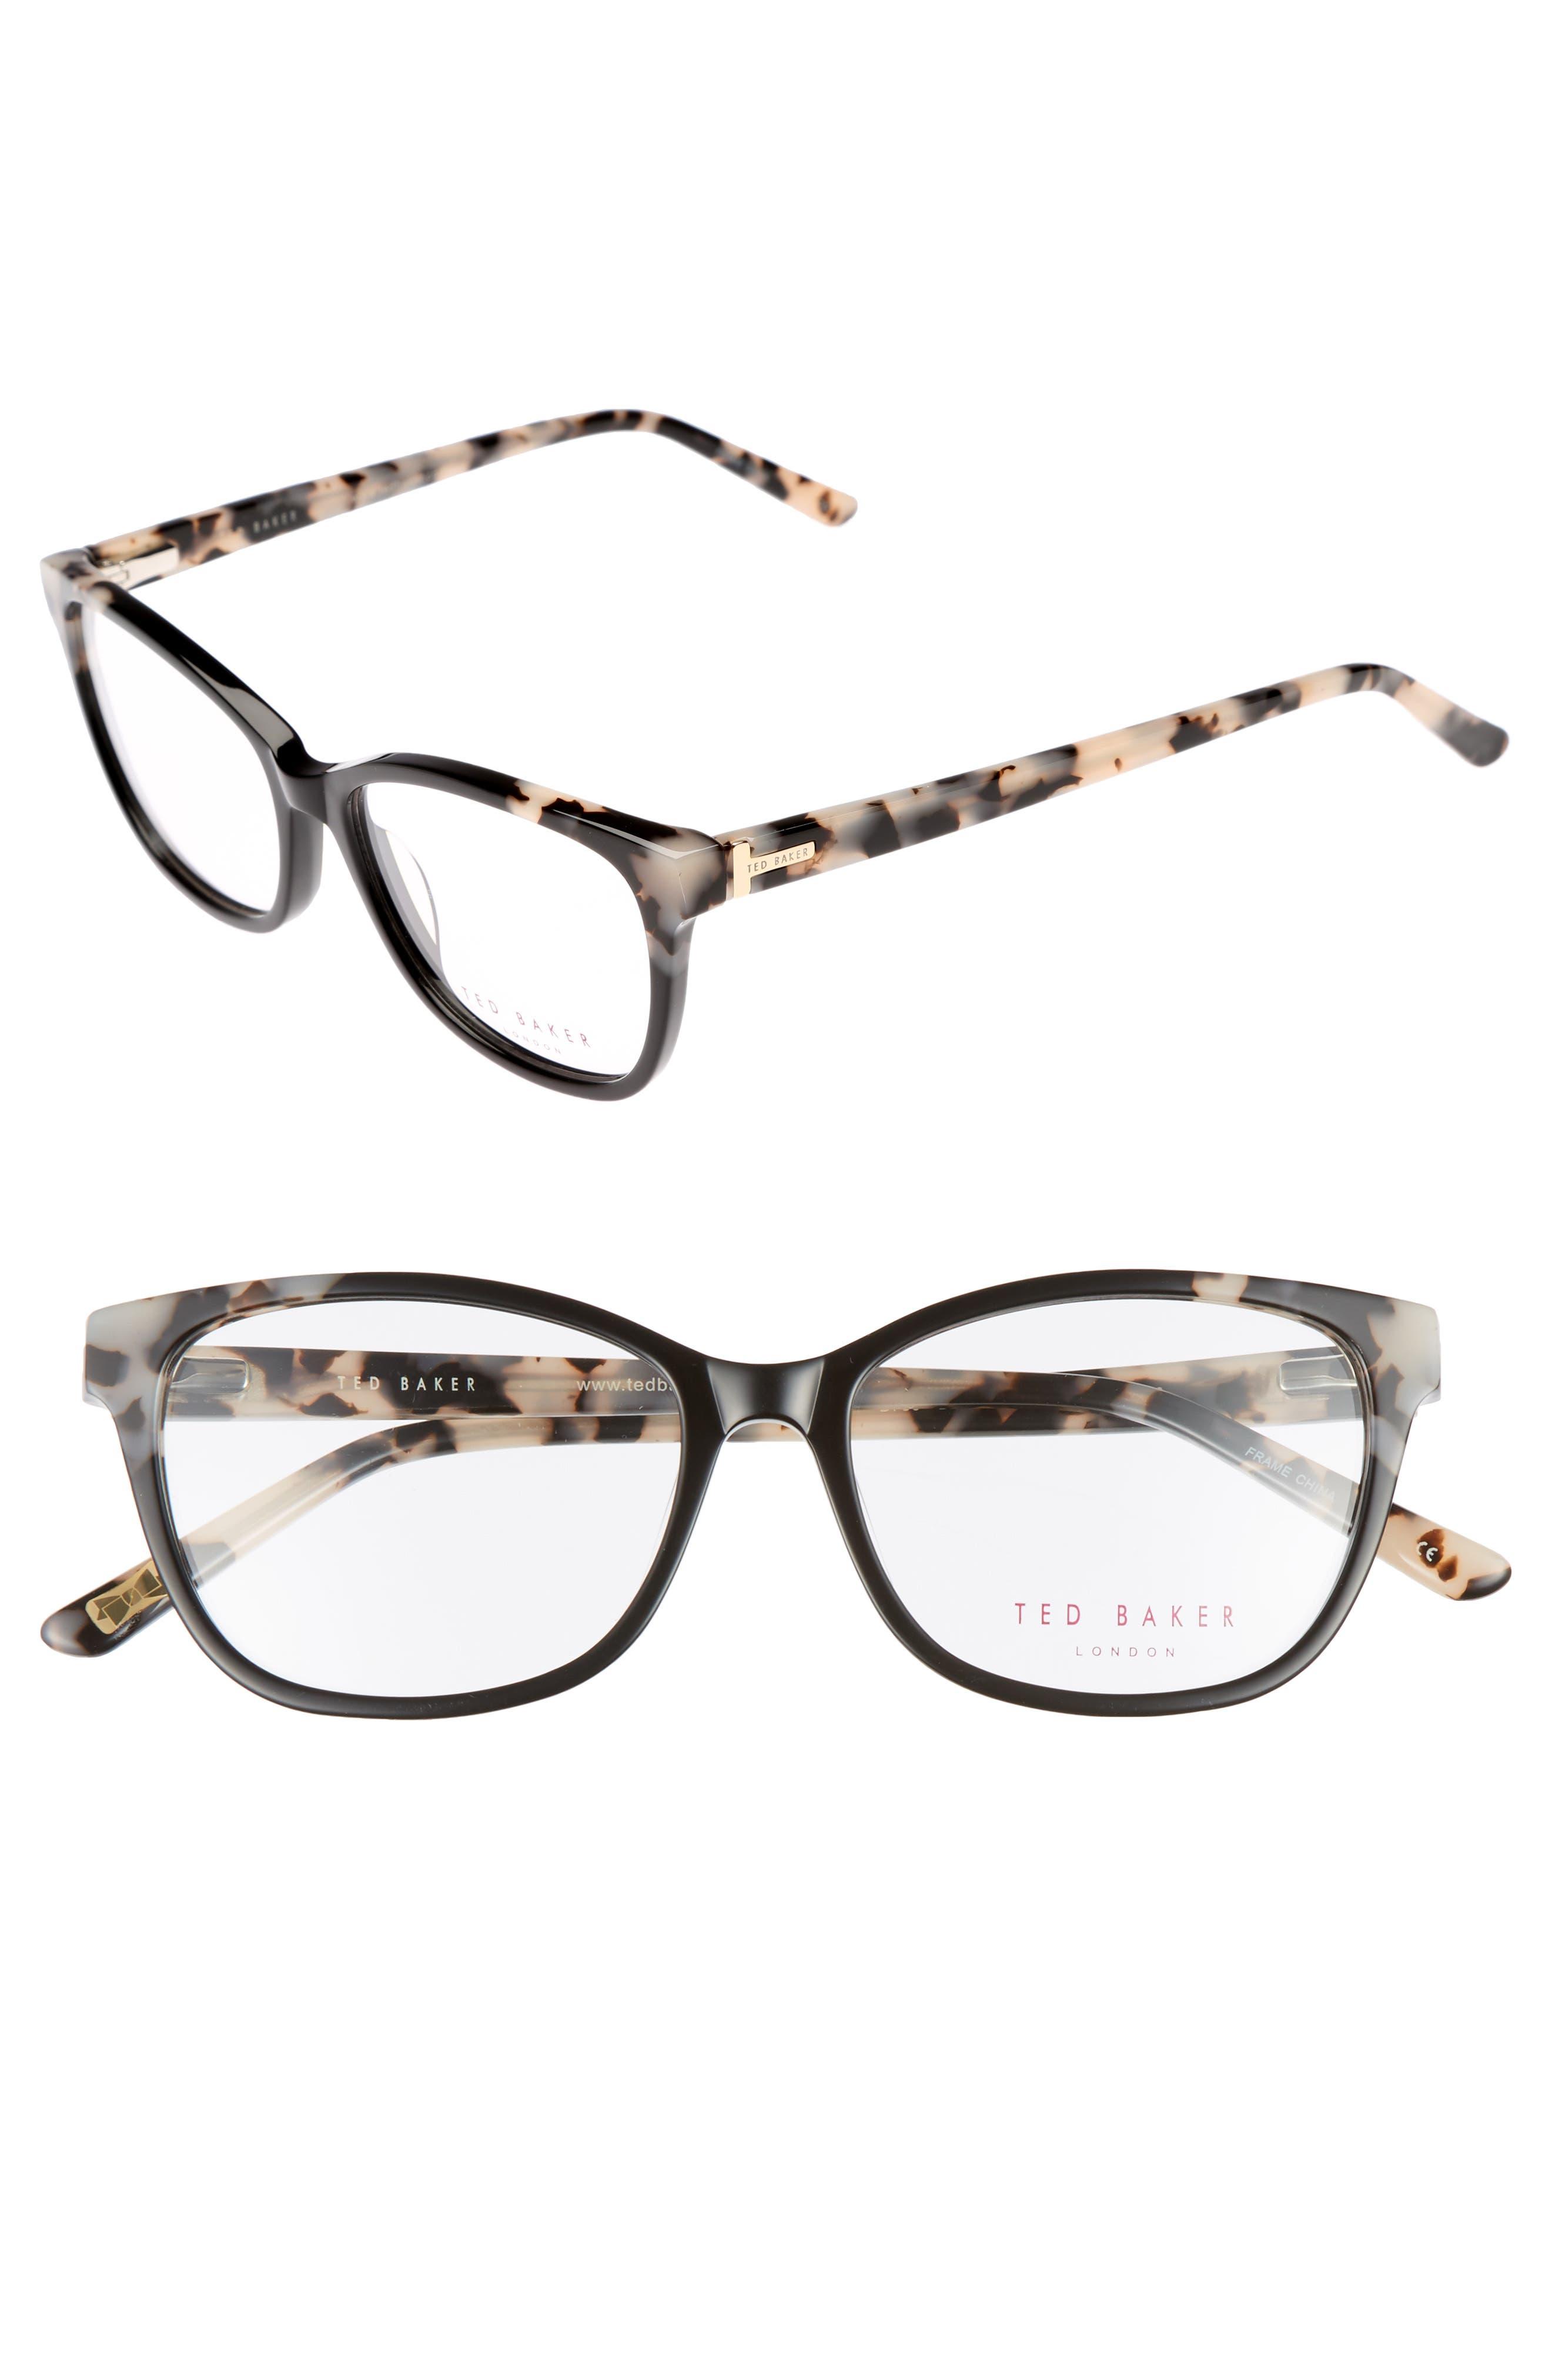 52mm Square Optical Glasses,                         Main,                         color, Black